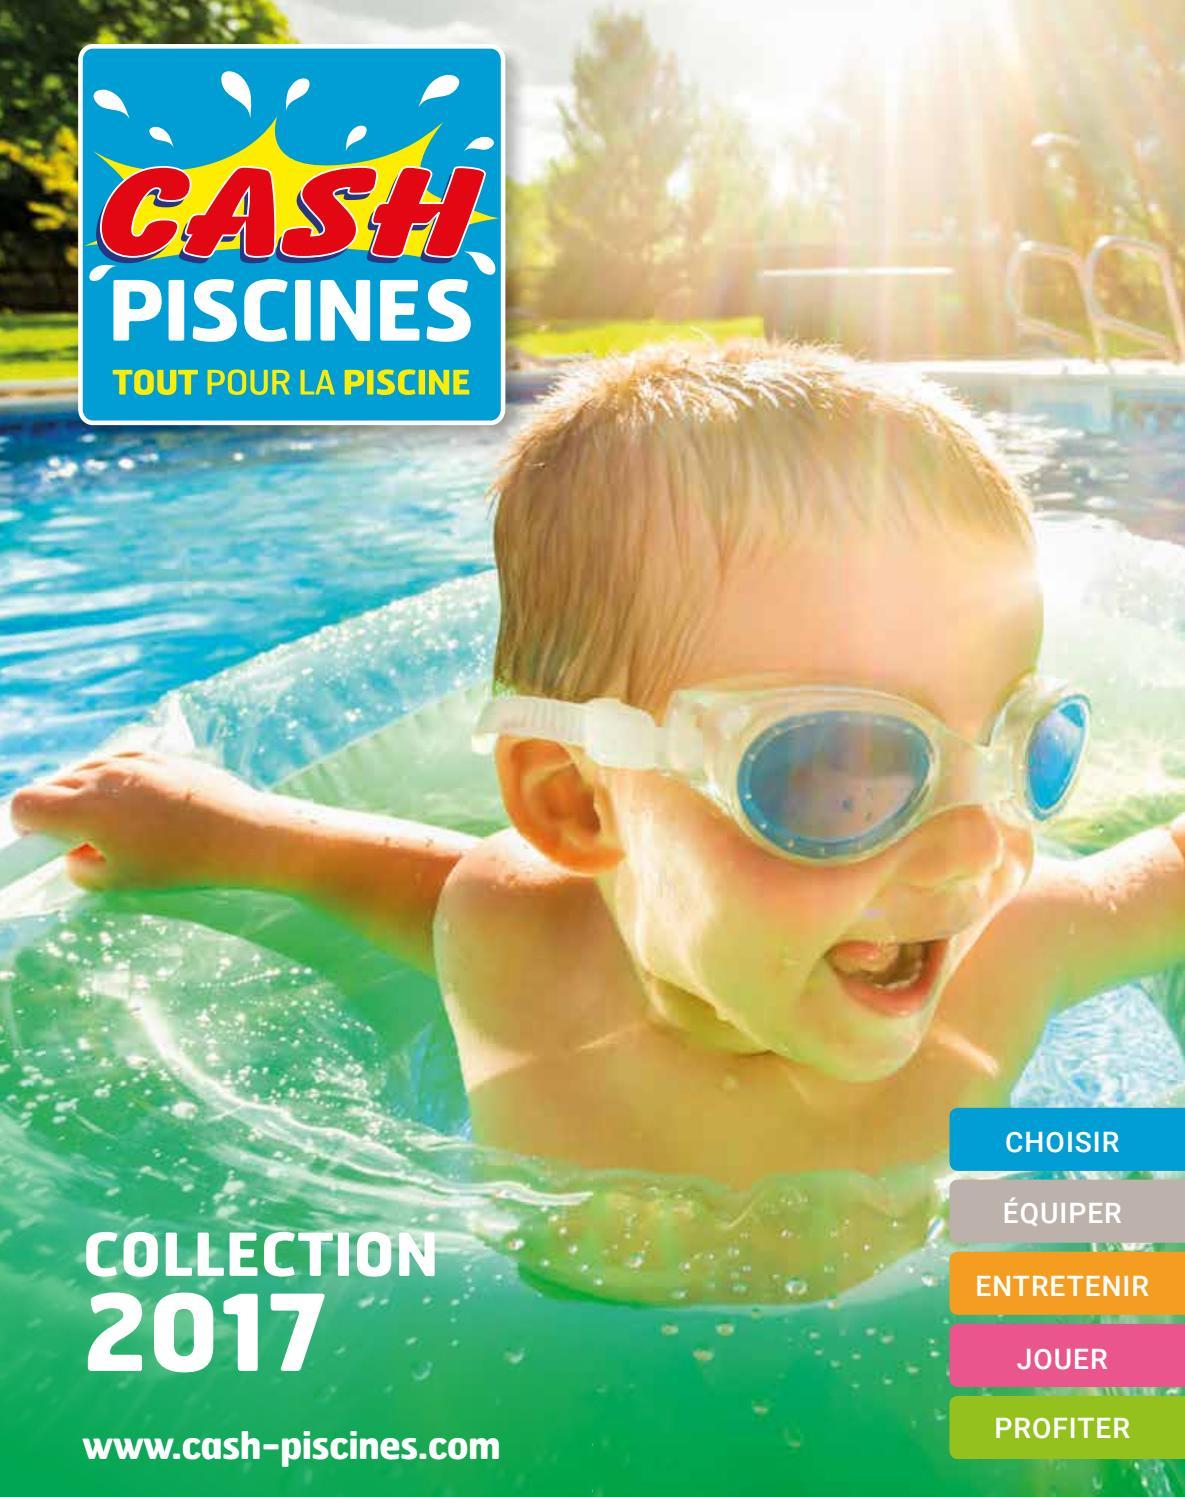 Catalogue Cash Piscine 2017 By Octave Octave - Issuu serapportantà Cash Piscine Marmande